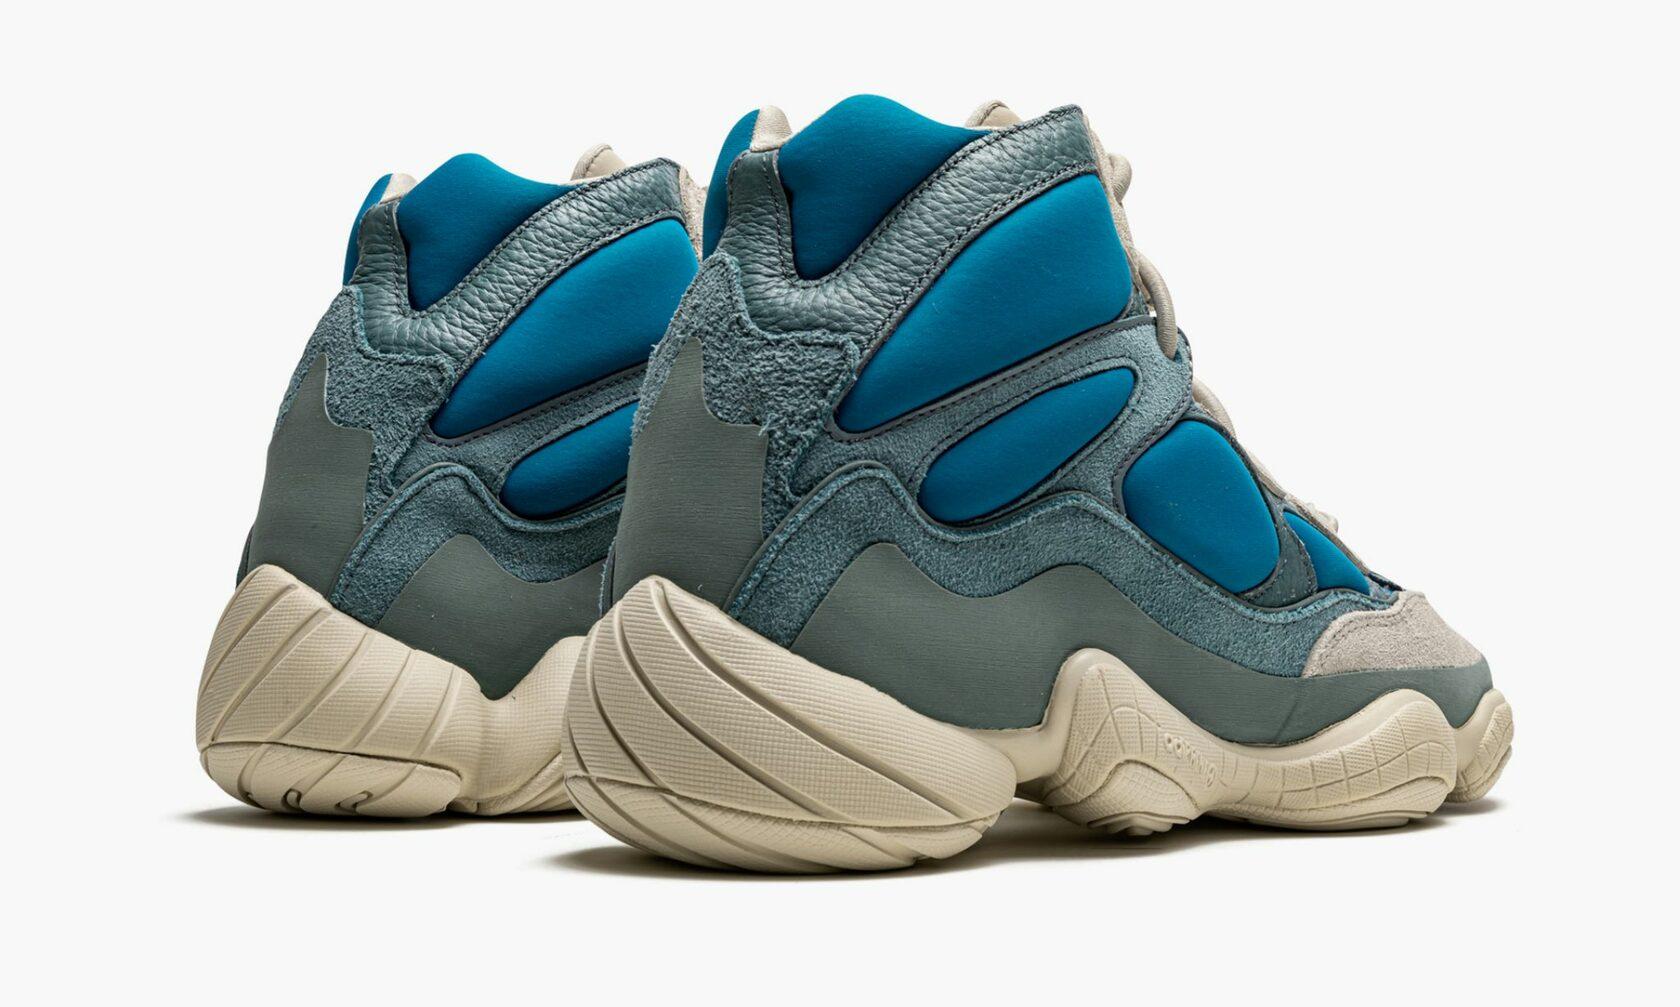 ADIDAS YEEZY 500 HIGH FROSTED BLUE купить